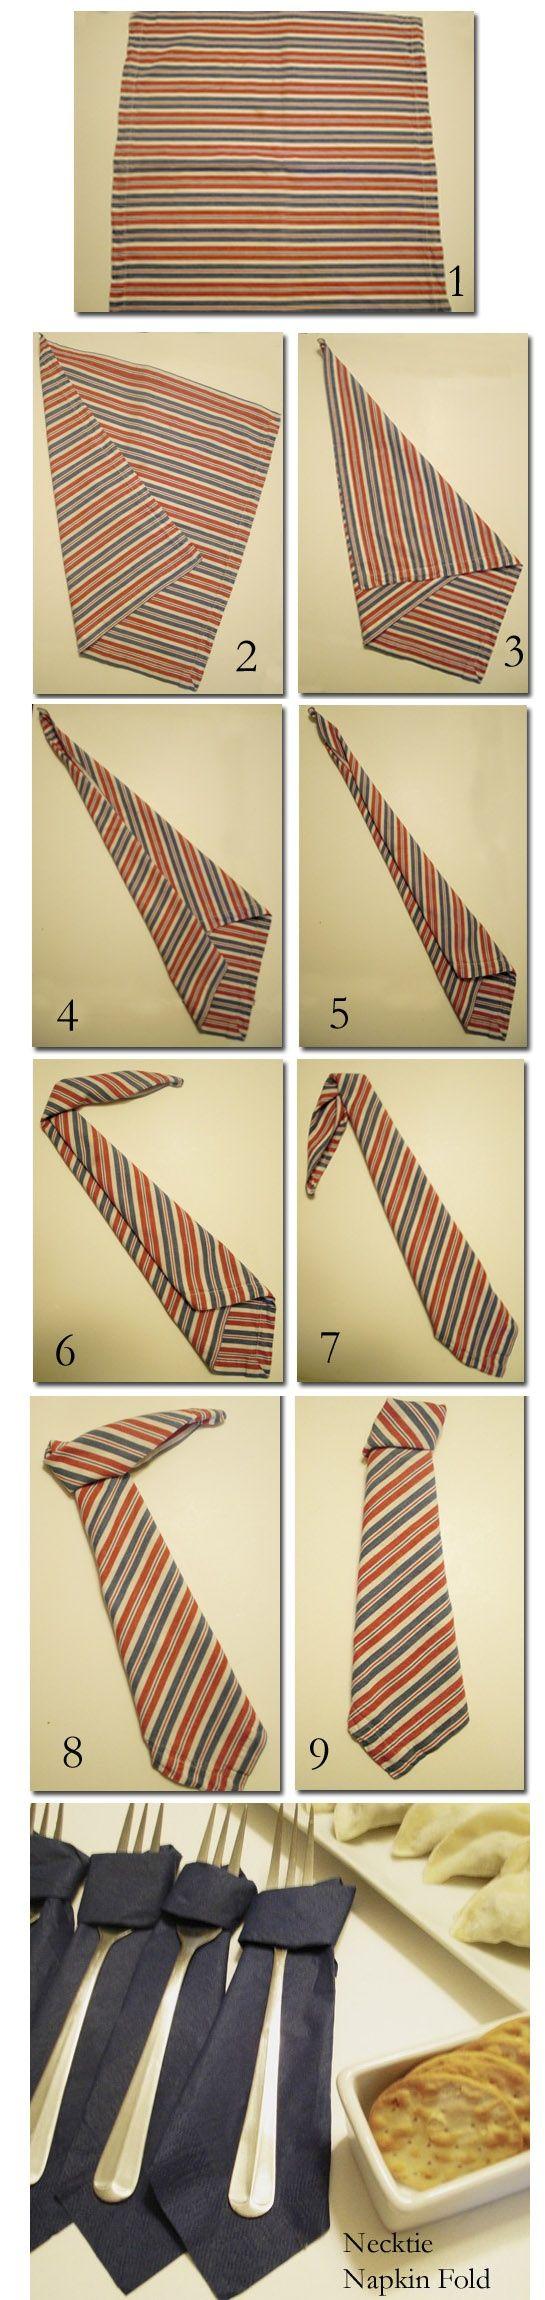 The Tie Fold | 28 Creative Napkin-Folding Techniques